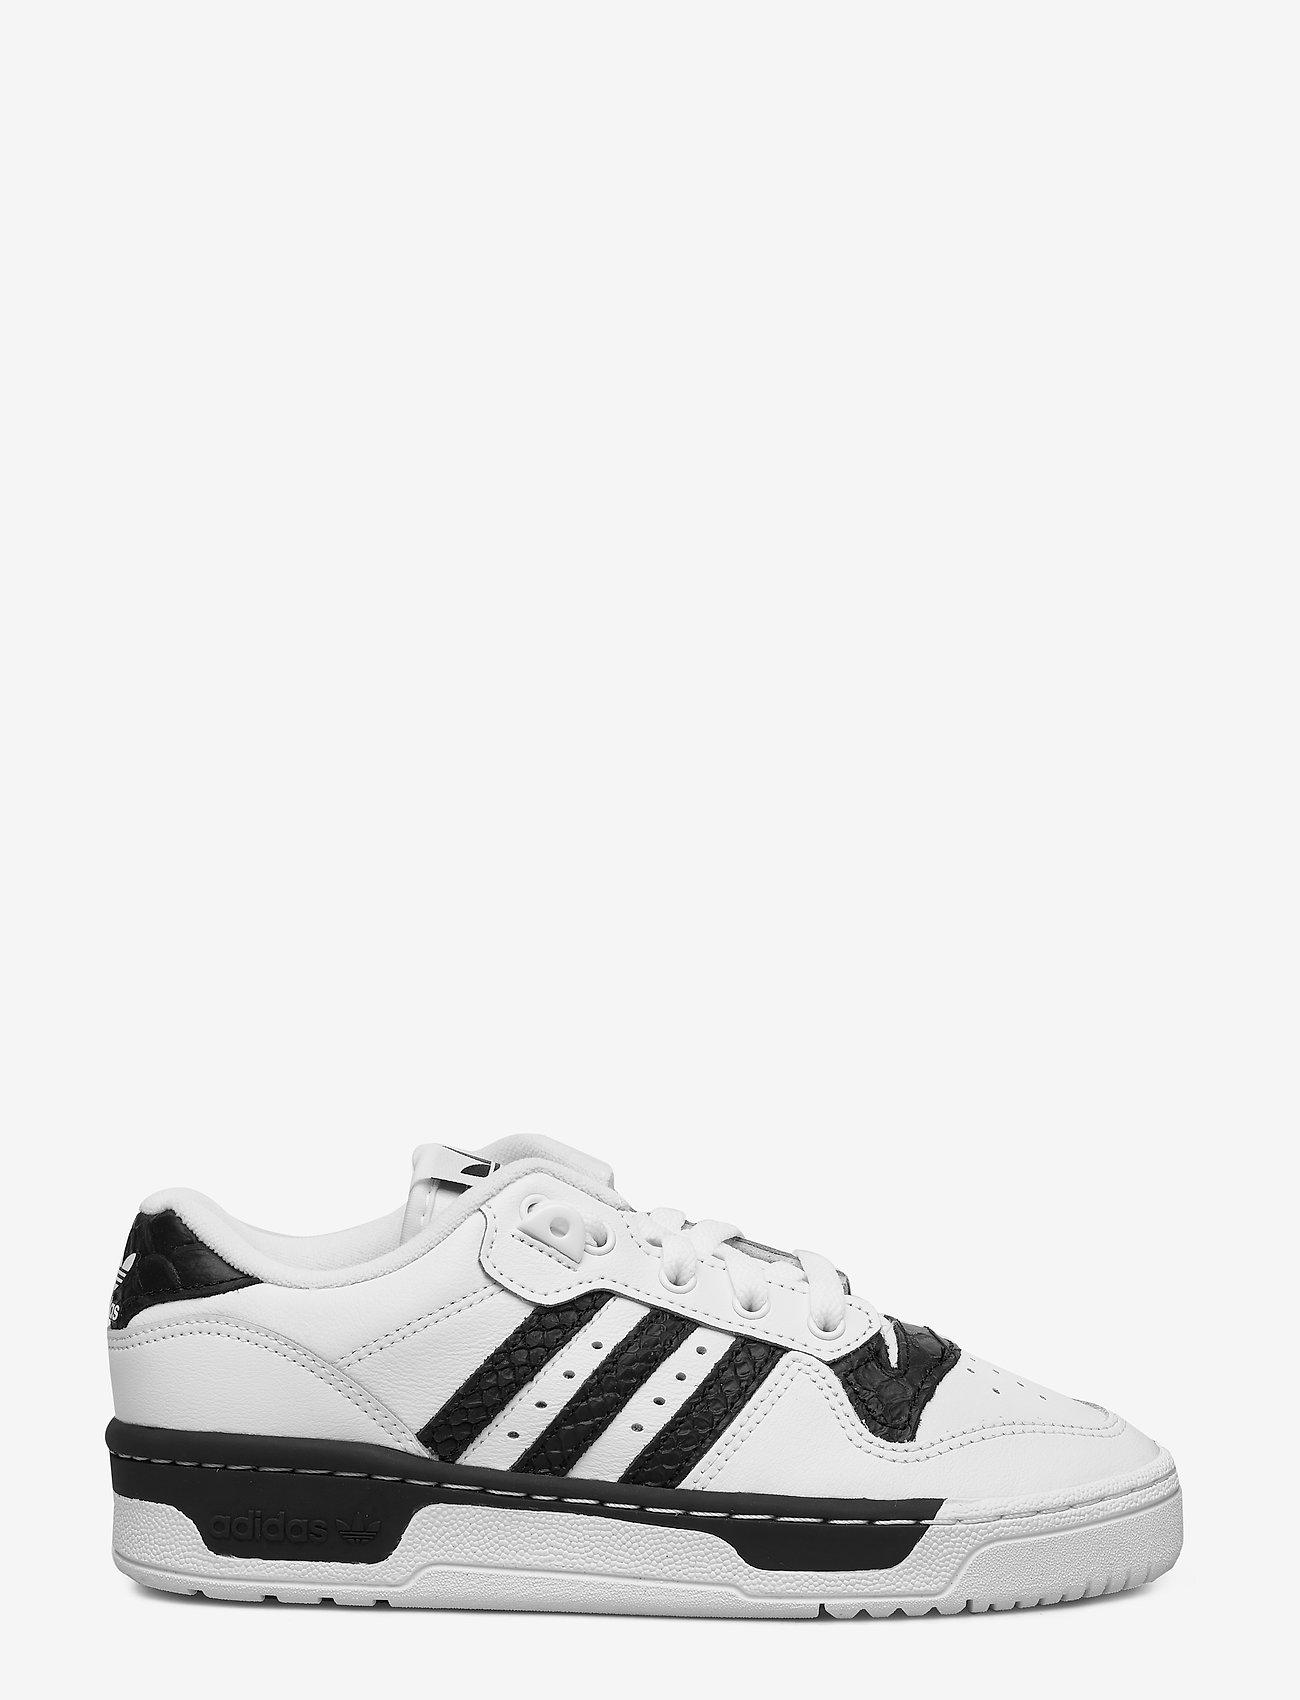 Adidas Originals Rivalry Low W - Sneakers Ftwwht/ftwwht/cblack